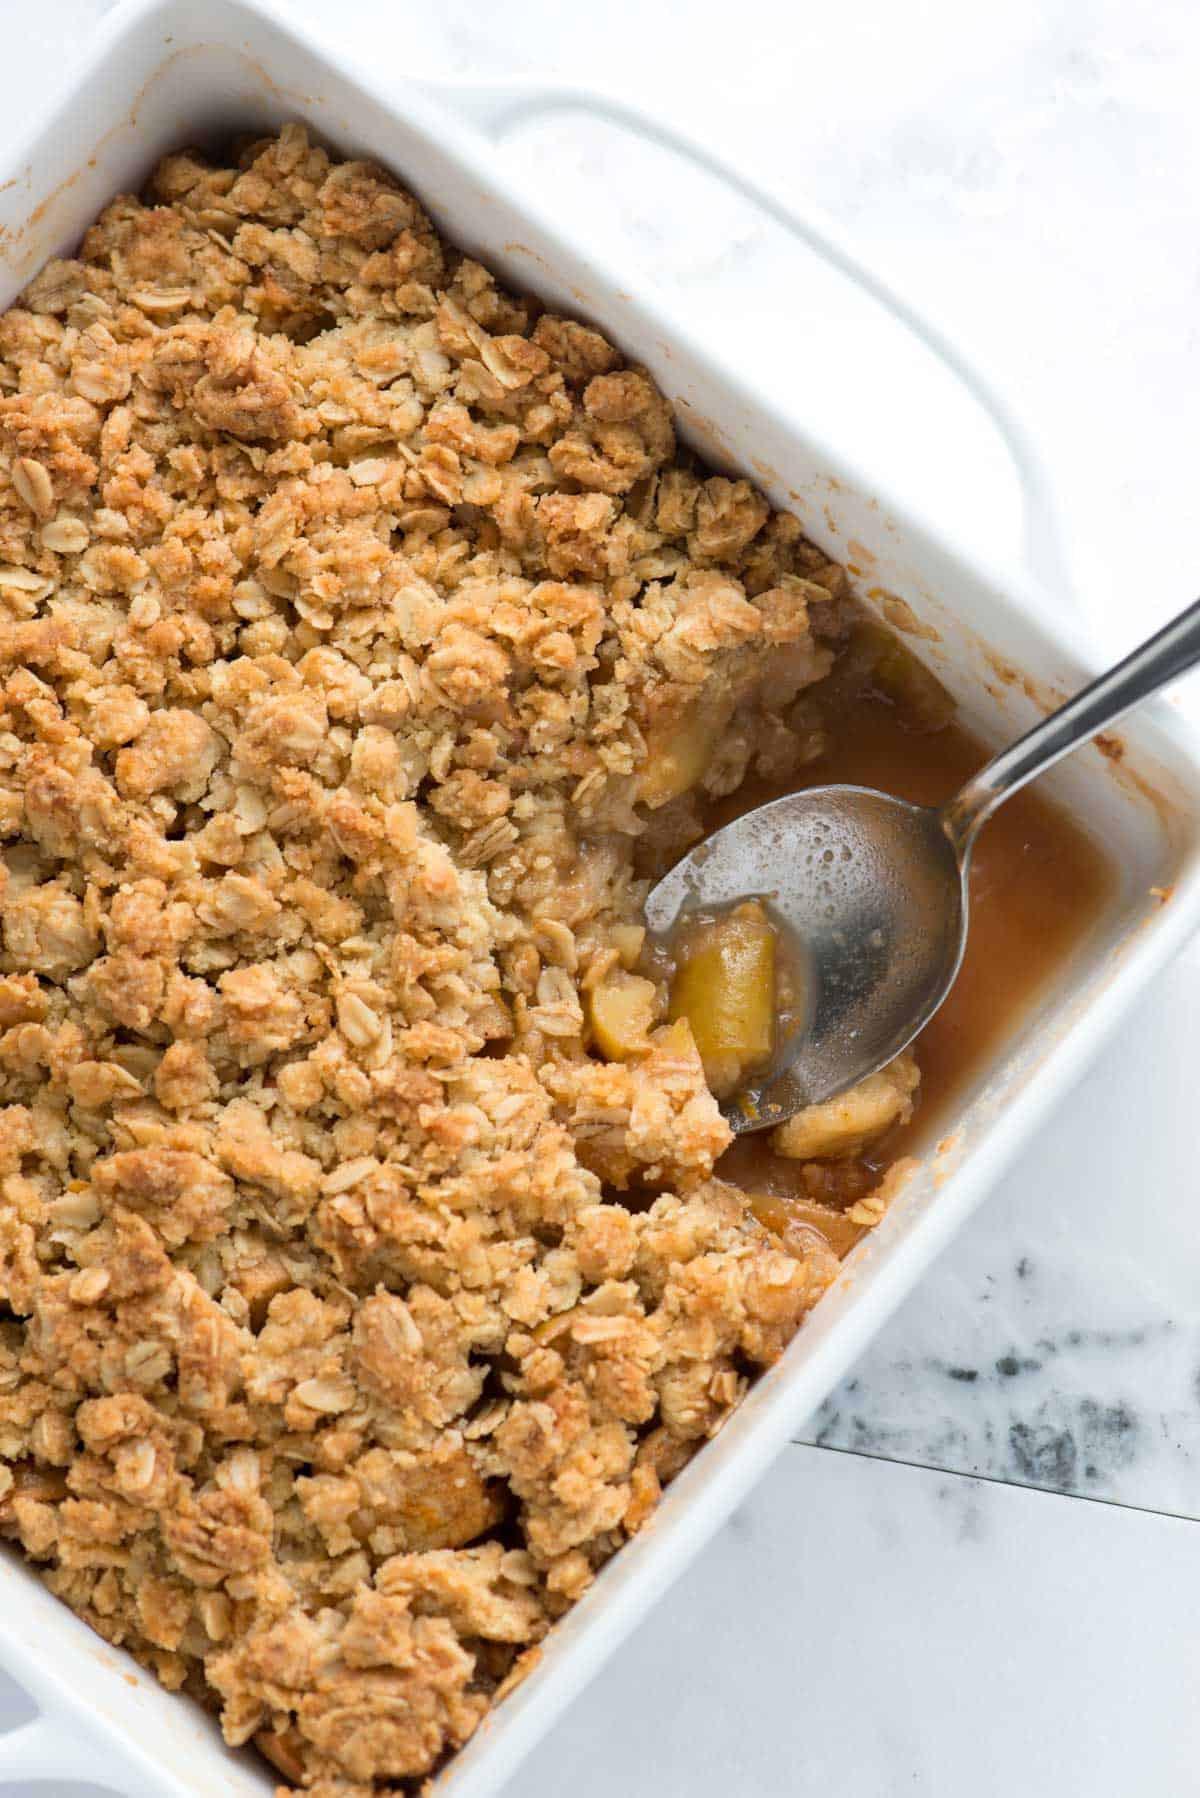 Apple Crisp Dessert  Easy Apple Crisp Recipe with Oats